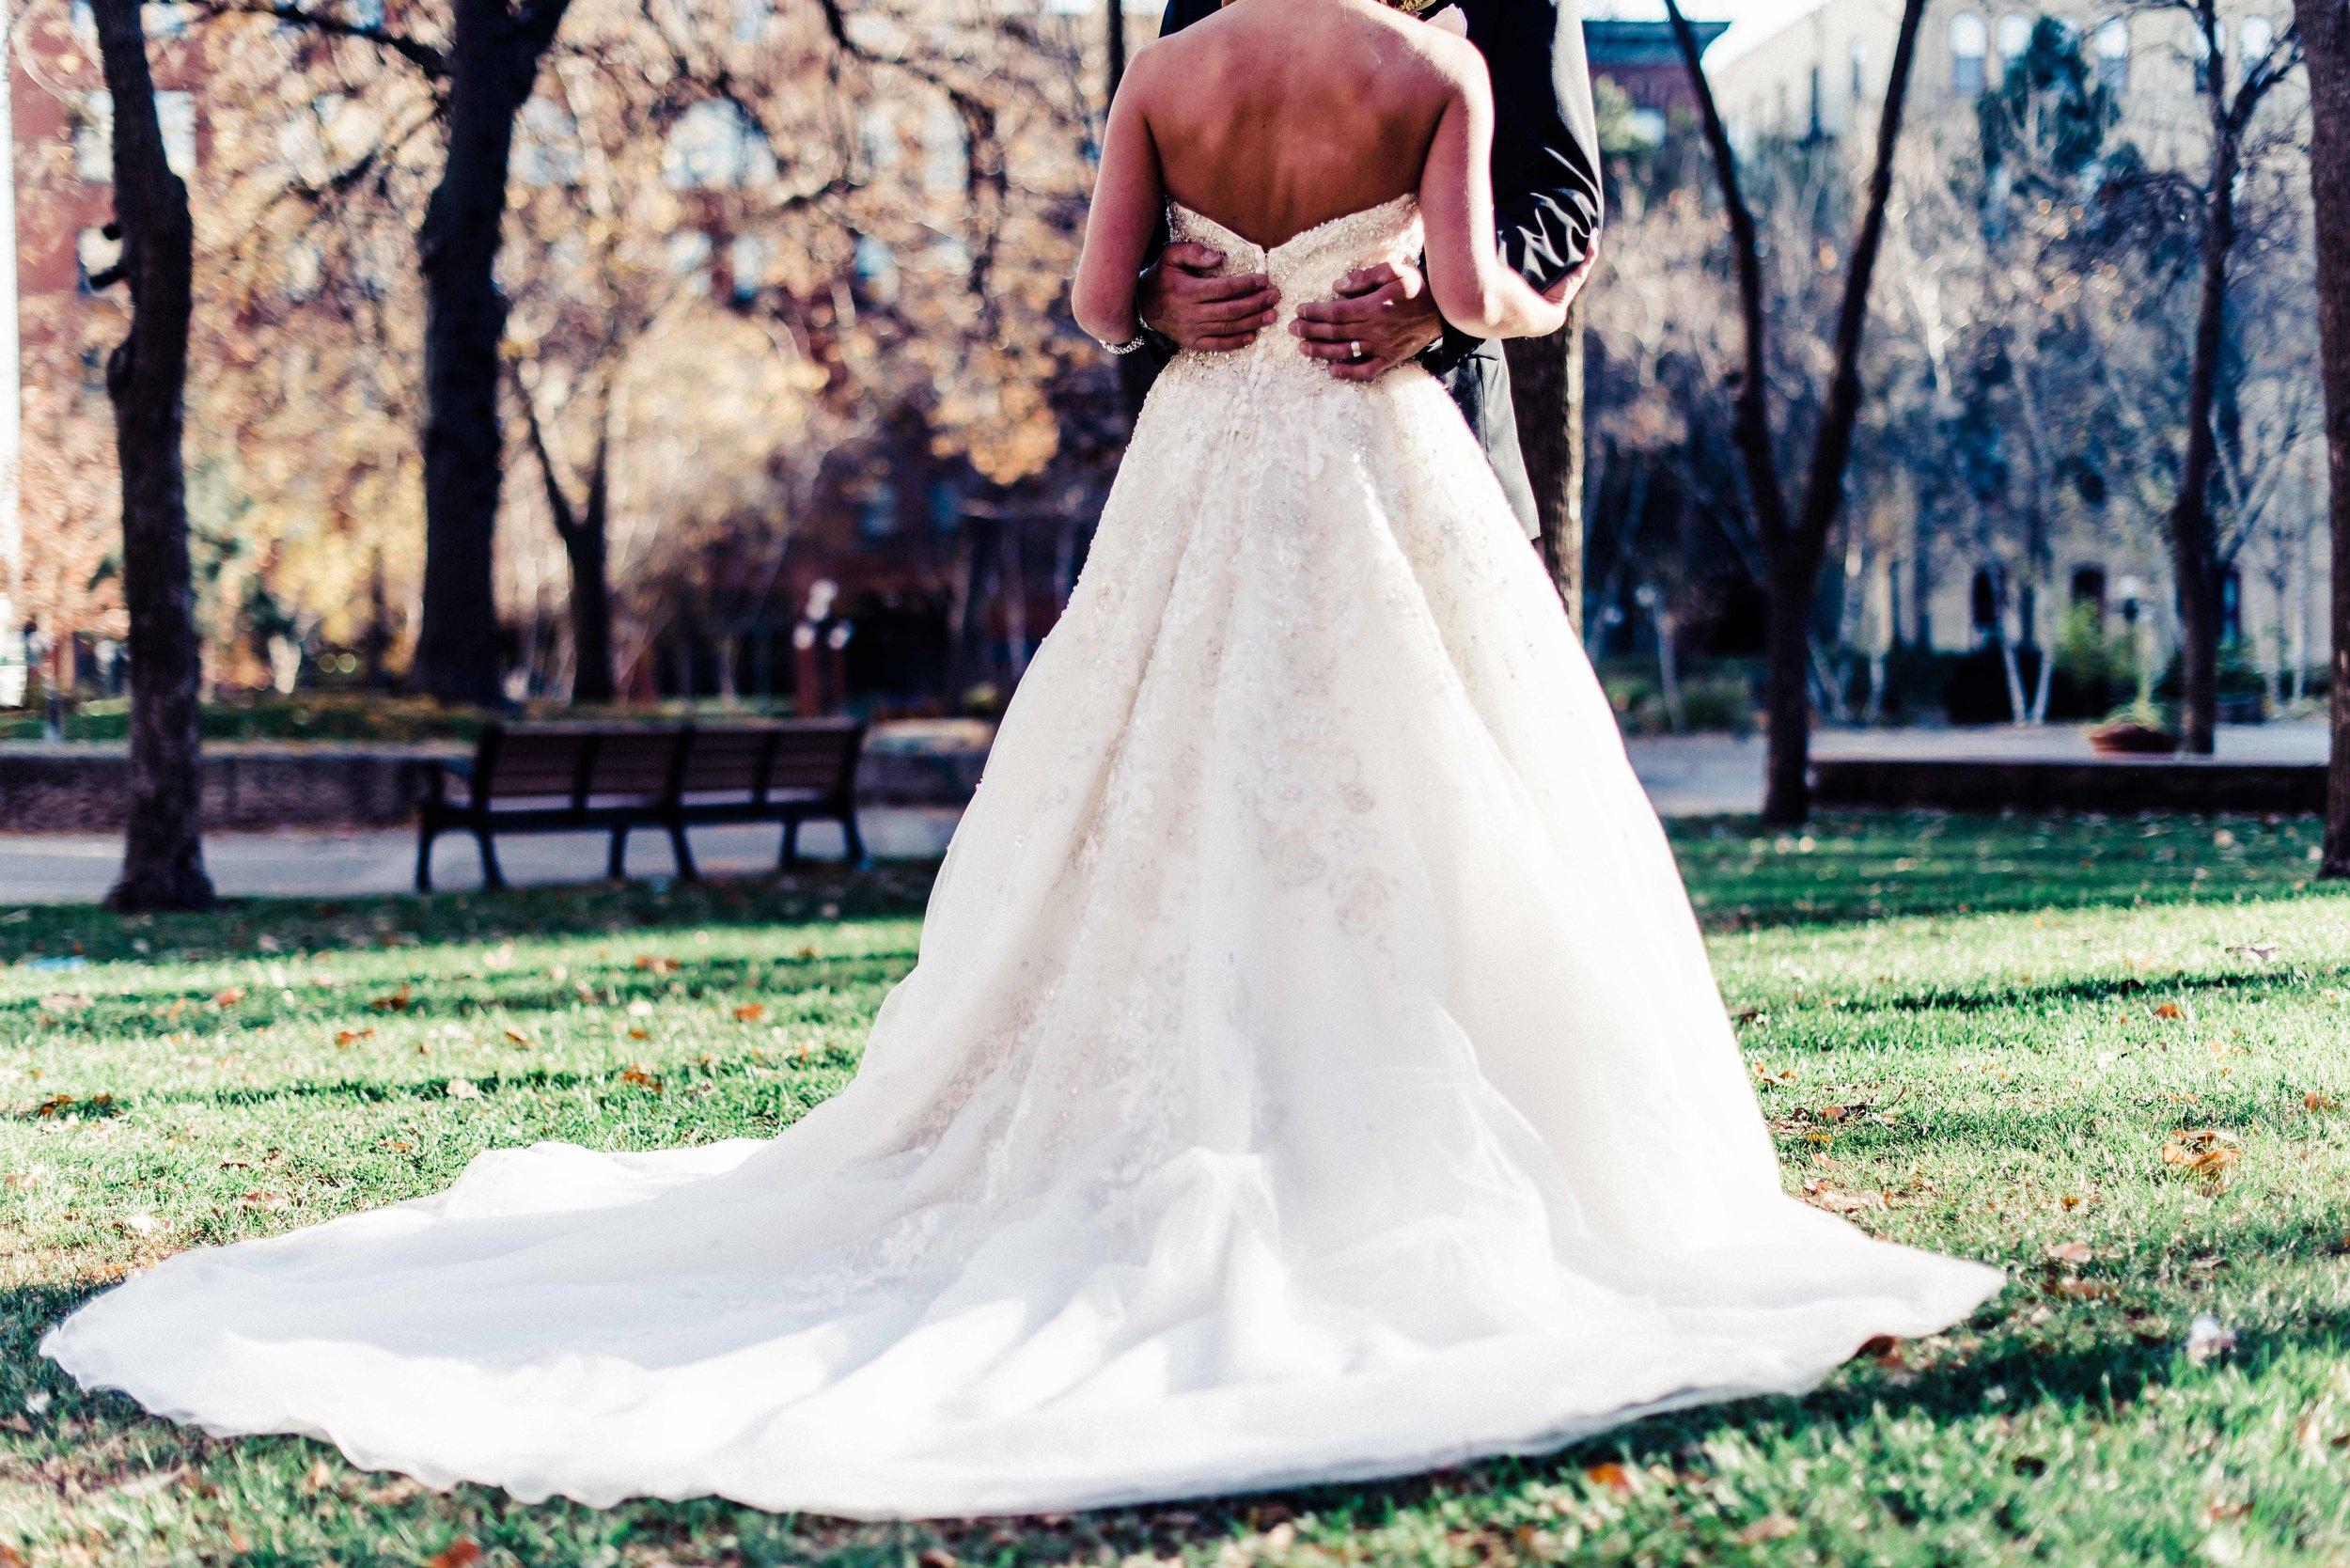 Minneapolis St Paul Twin Cities John Notman Wedding Engagement Best Candid Documentary Photography-3721.jpg